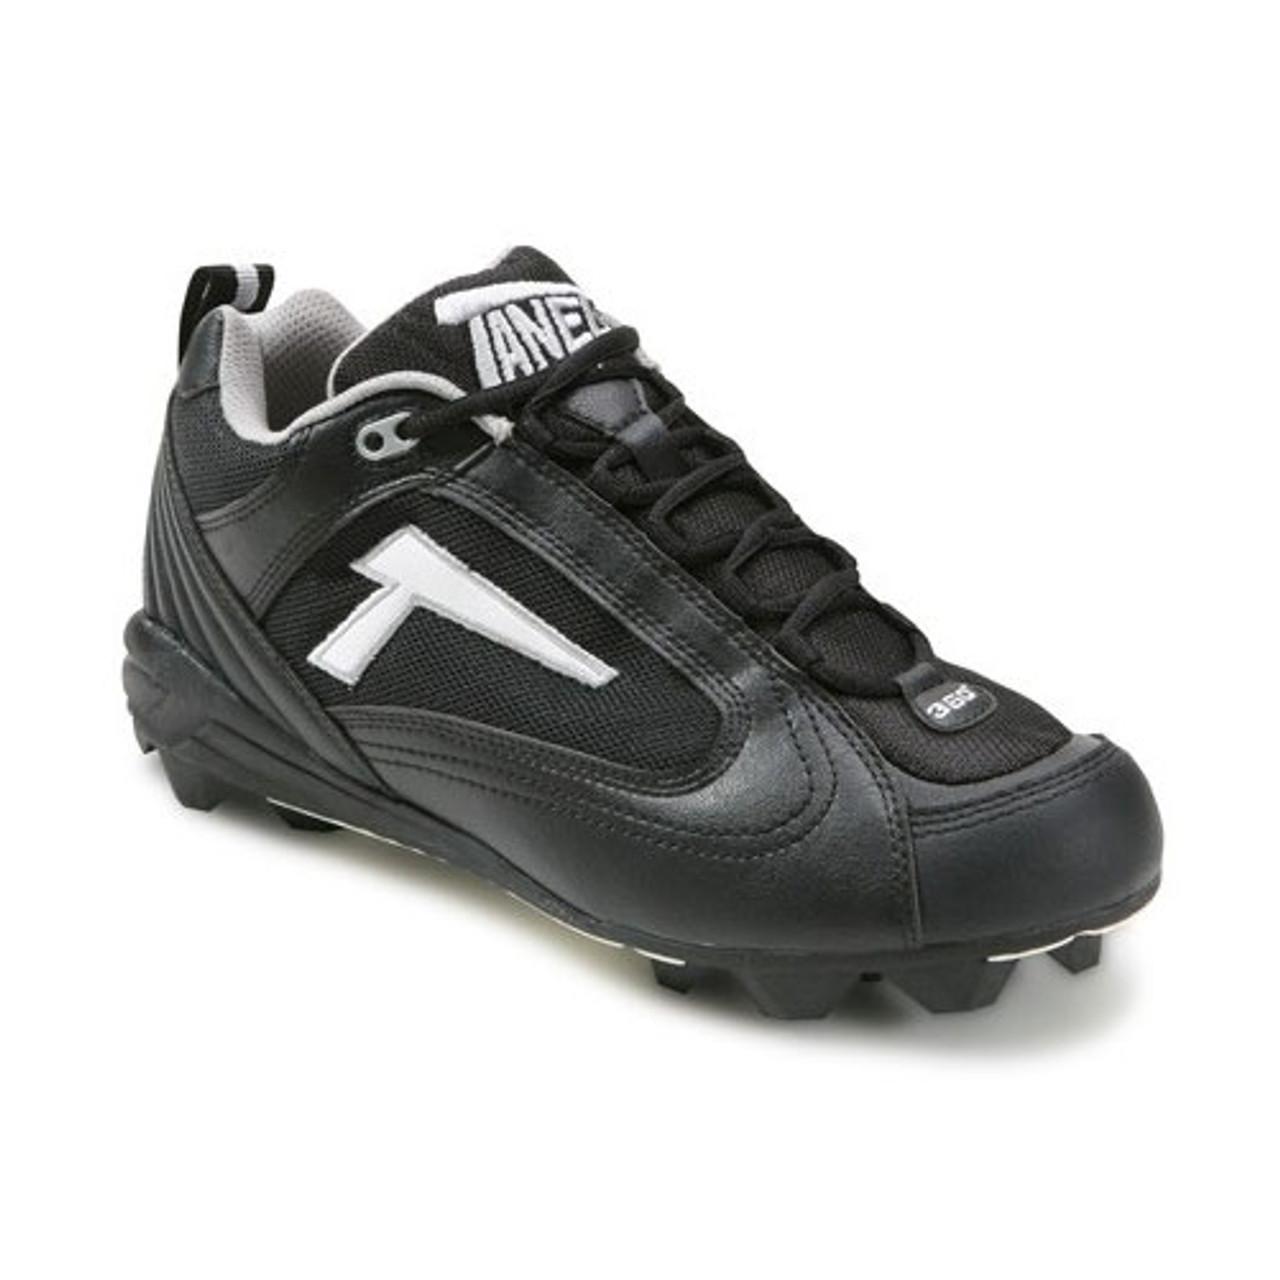 Tanel 360 RPM Cleat Low Baseball Softball Cleats - Tanel 360 b1093569768